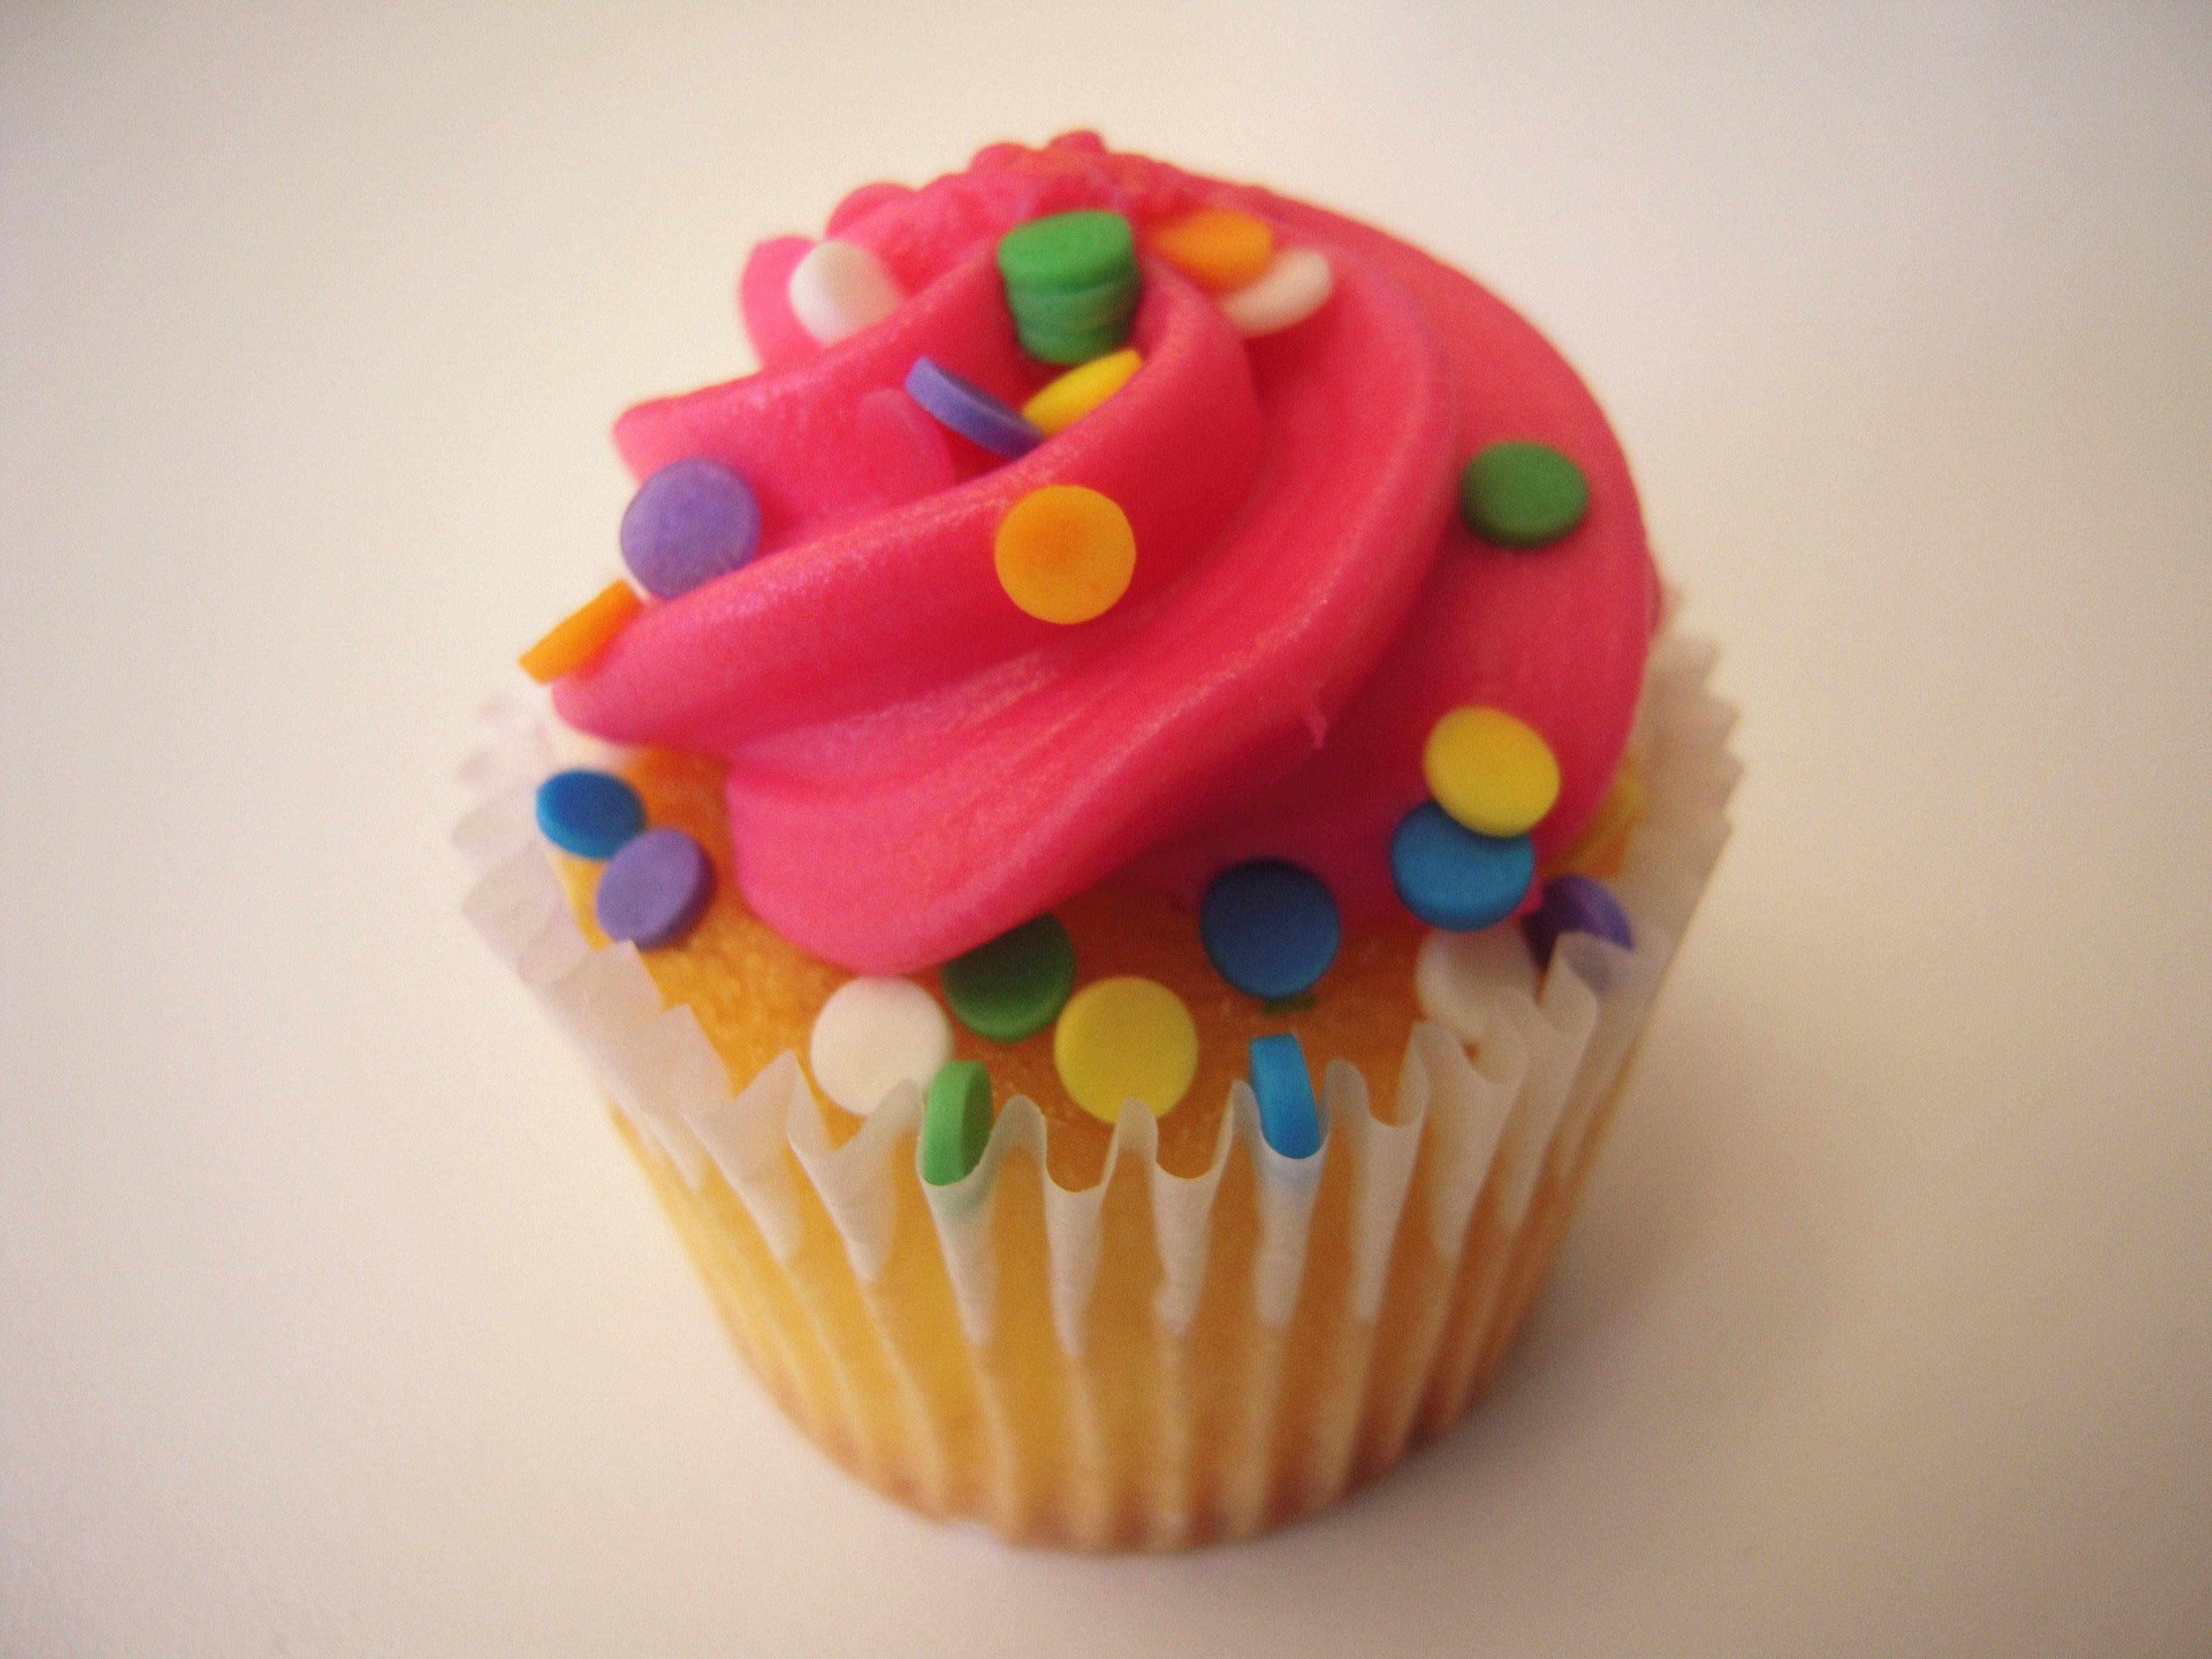 Image Cupcake Cake